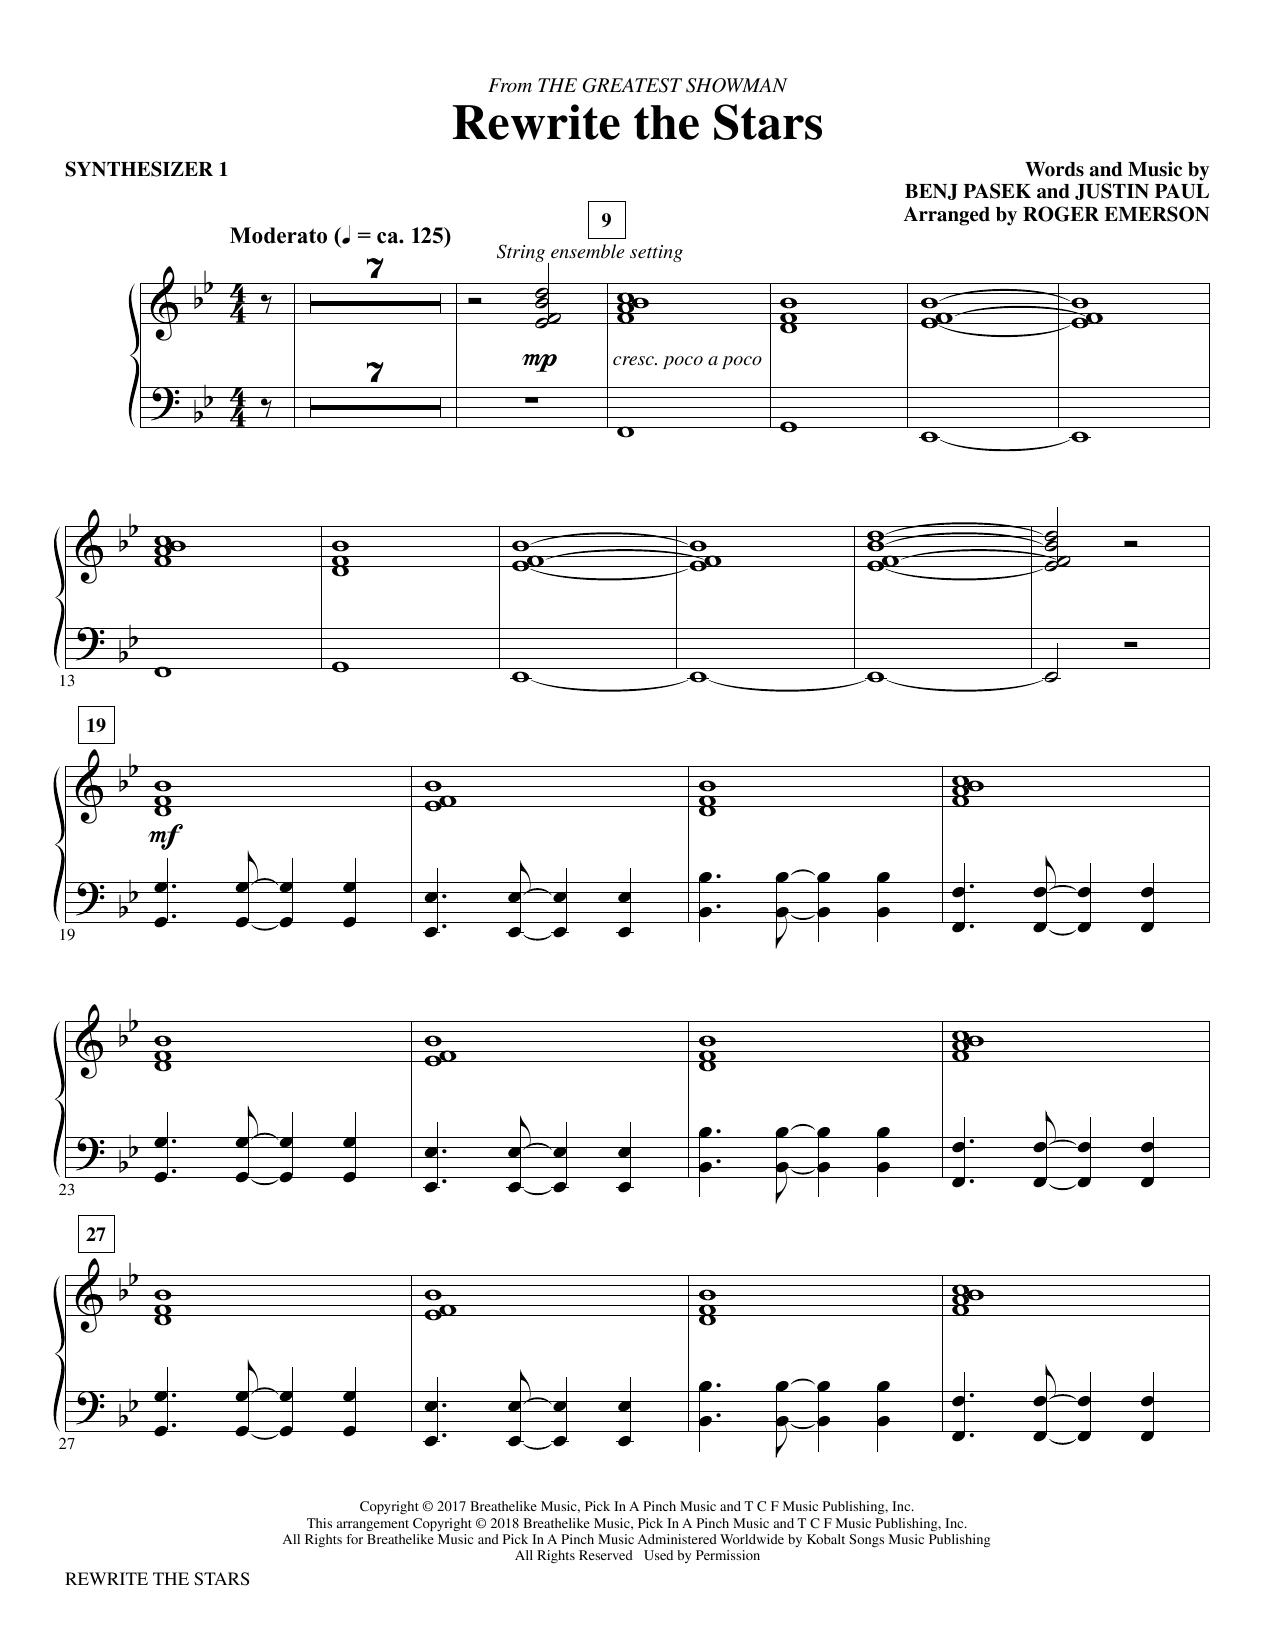 Pasek & Paul Rewrite The Stars (arr. Roger Emerson) - Synthesizer I sheet music notes printable PDF score